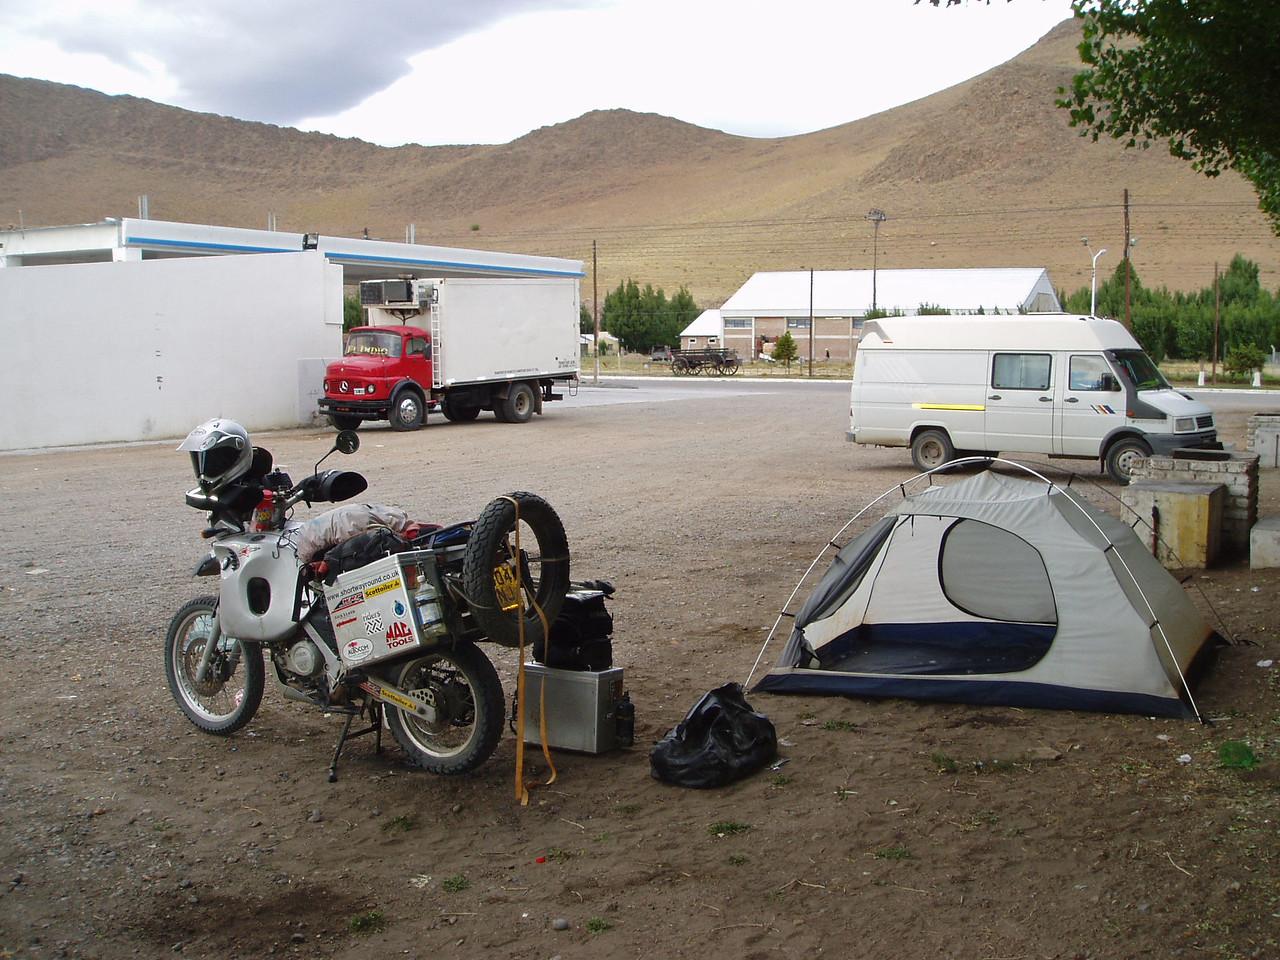 Camping at the YPF,  Gobernador Costa